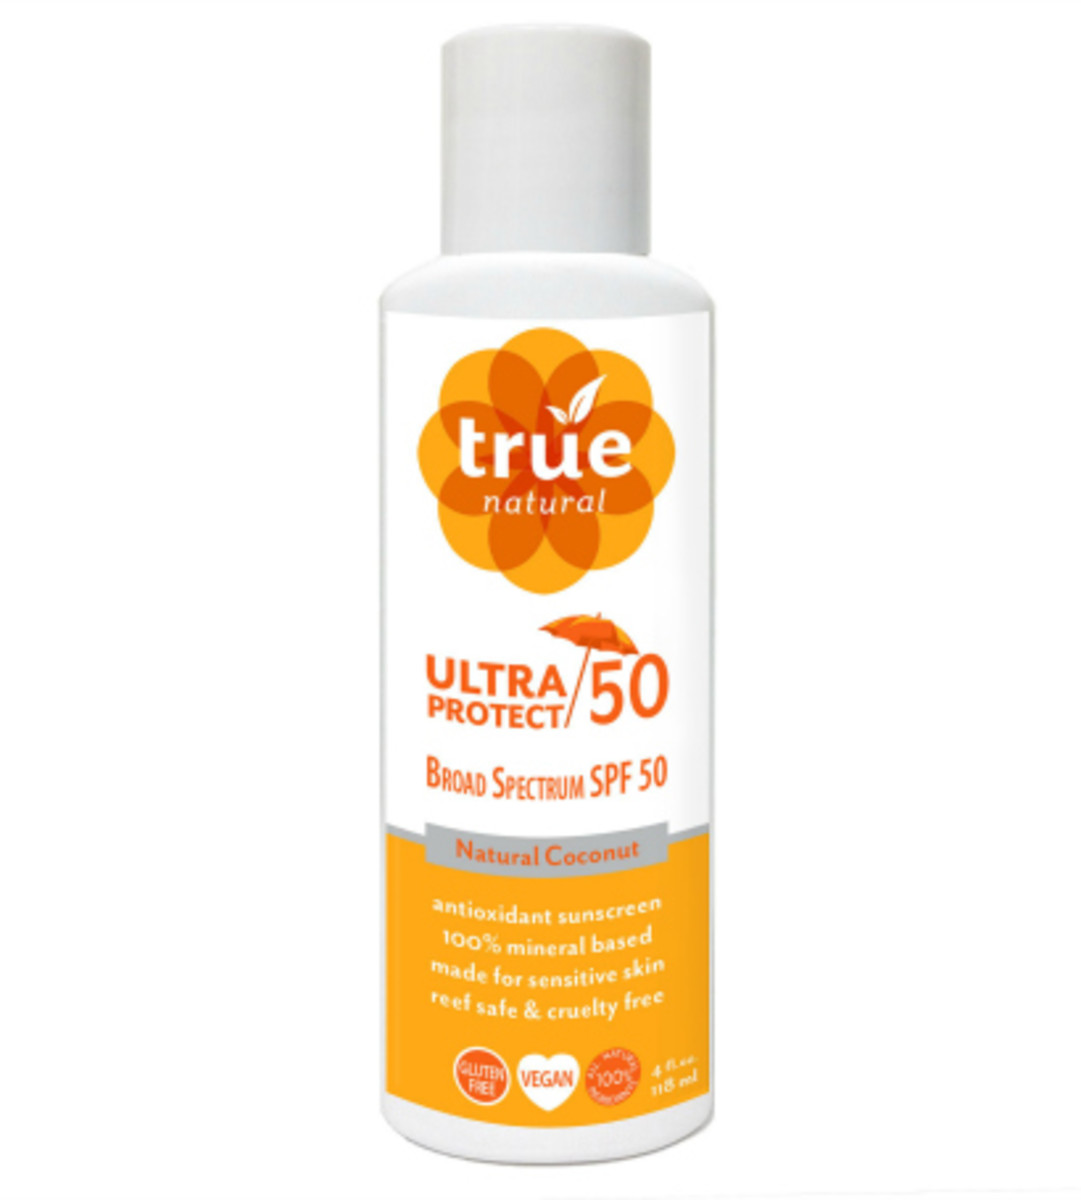 Natural Sunscreen True Natural Ultra 50